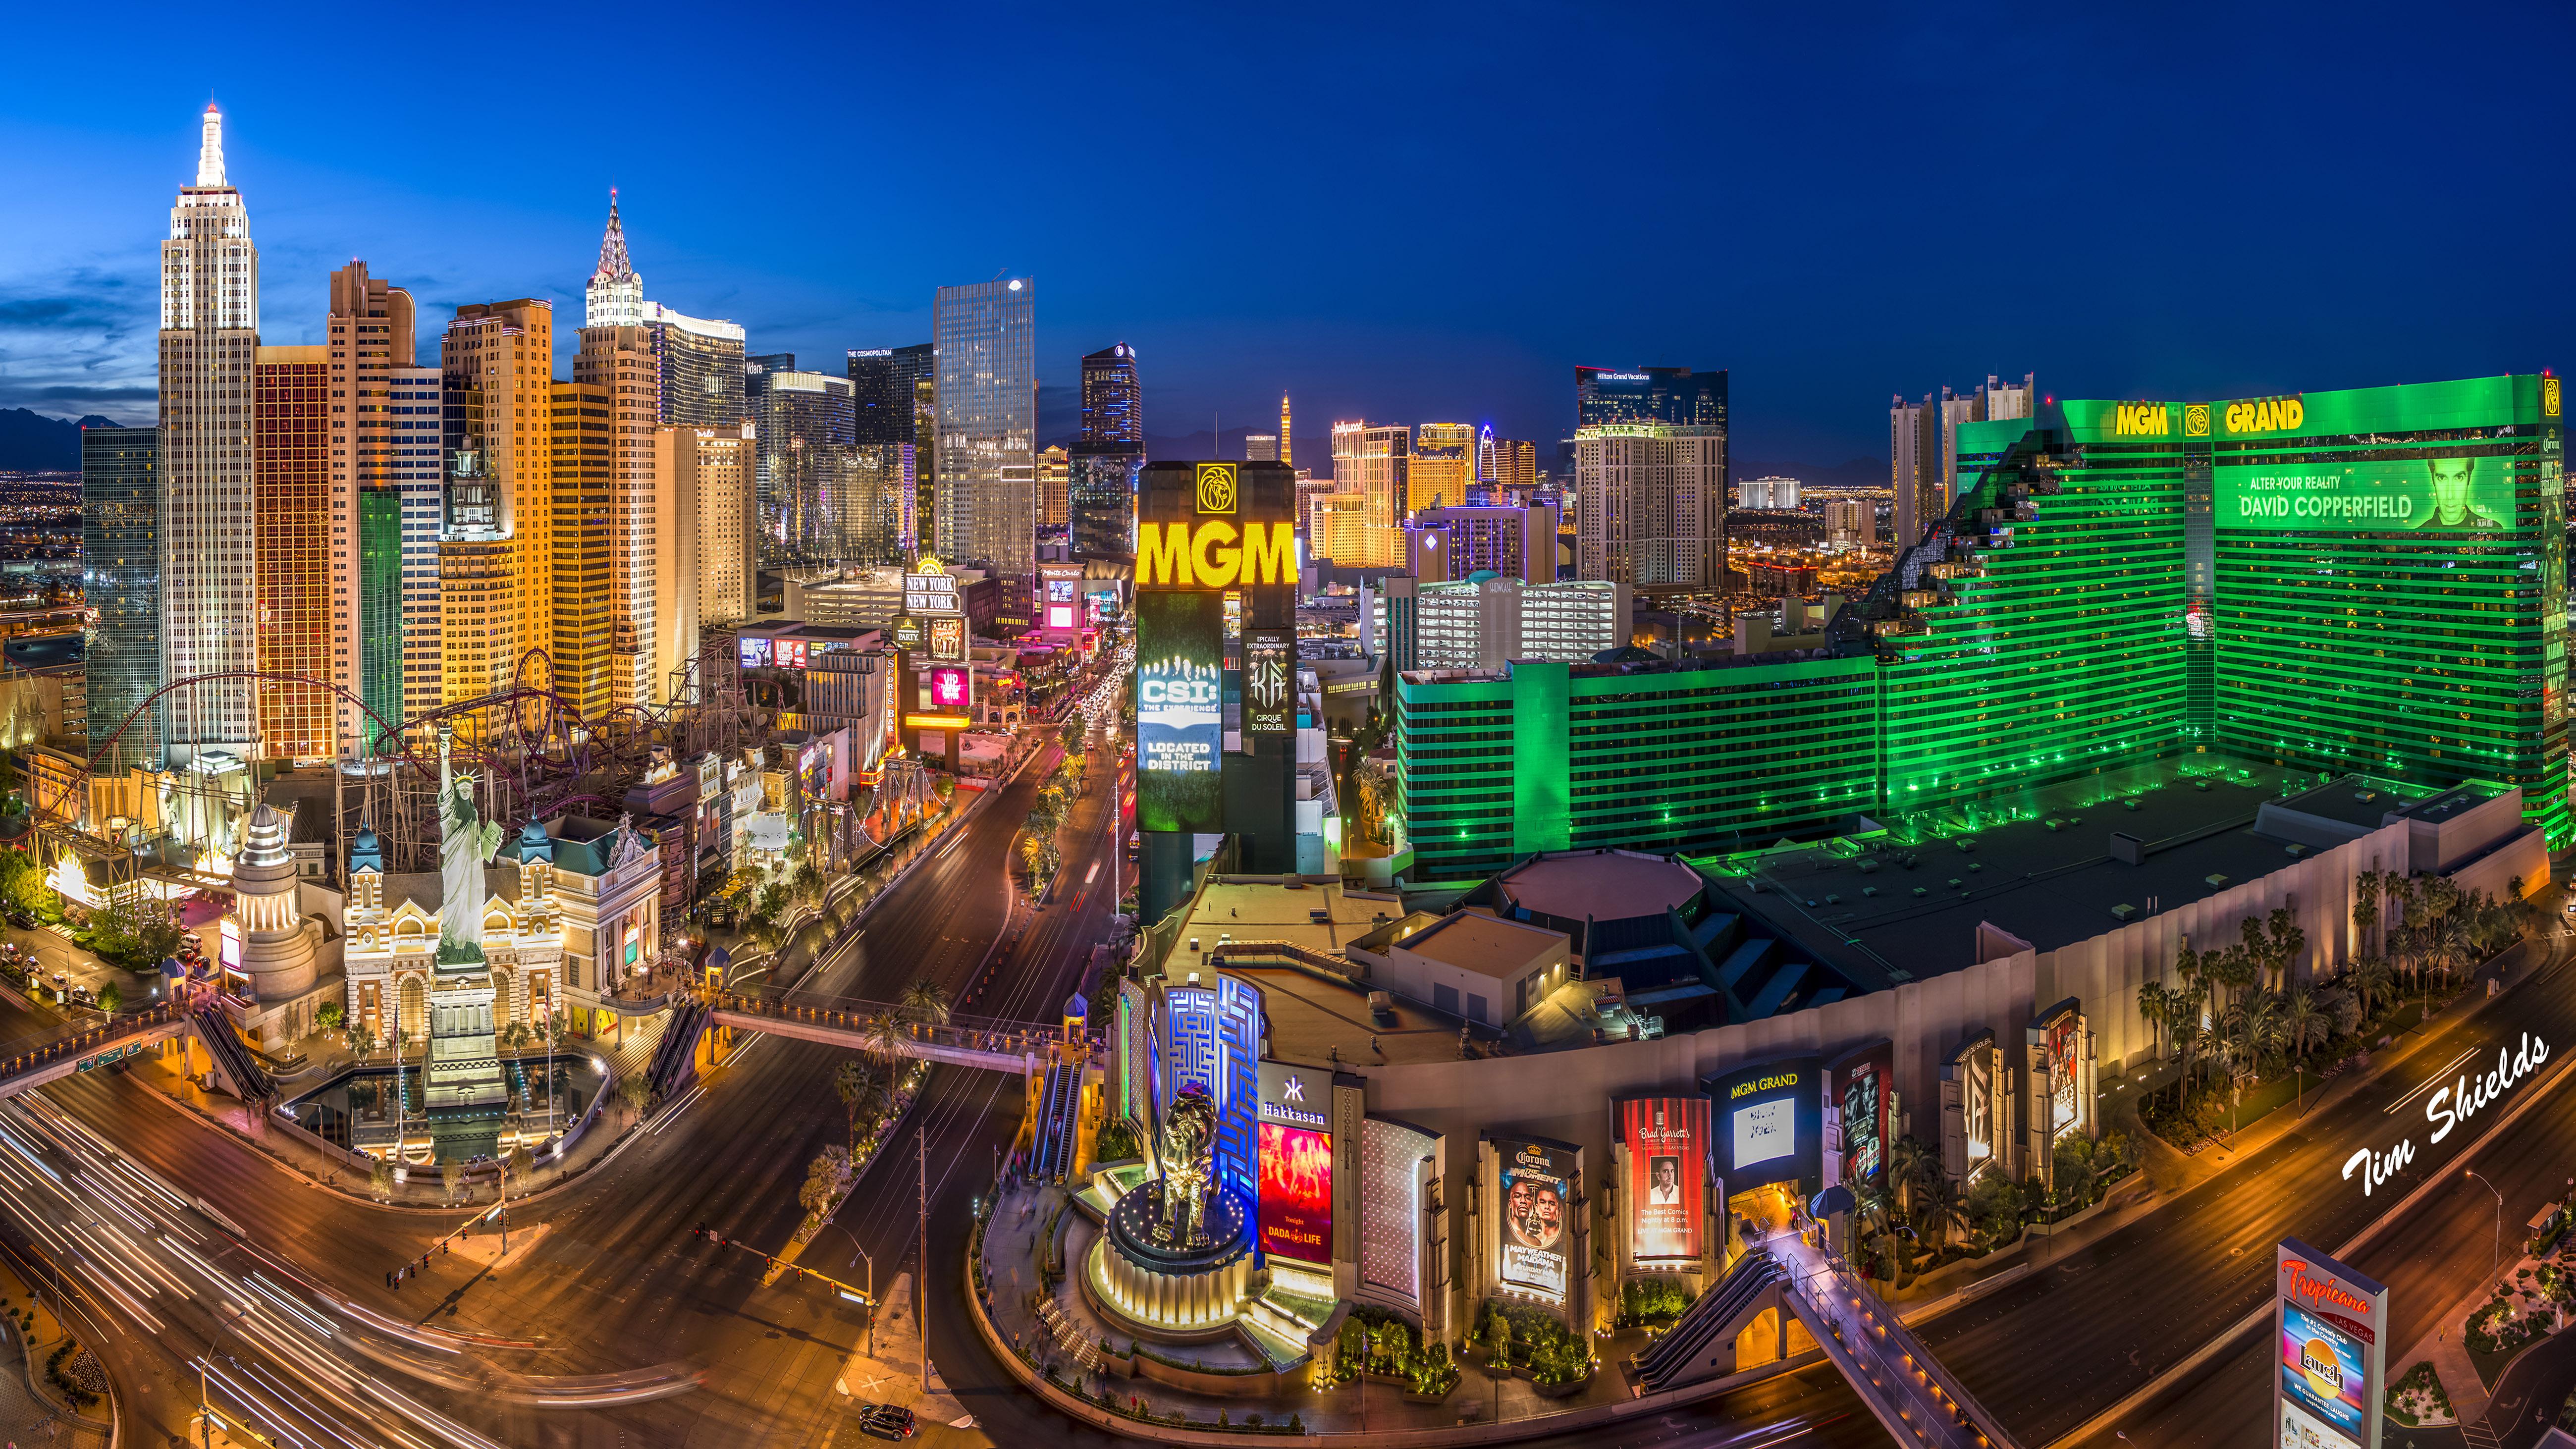 Las vegas nevada usa luxurious hotel casino restaurants place for entertainment and leisure - Nevada wallpaper hd ...